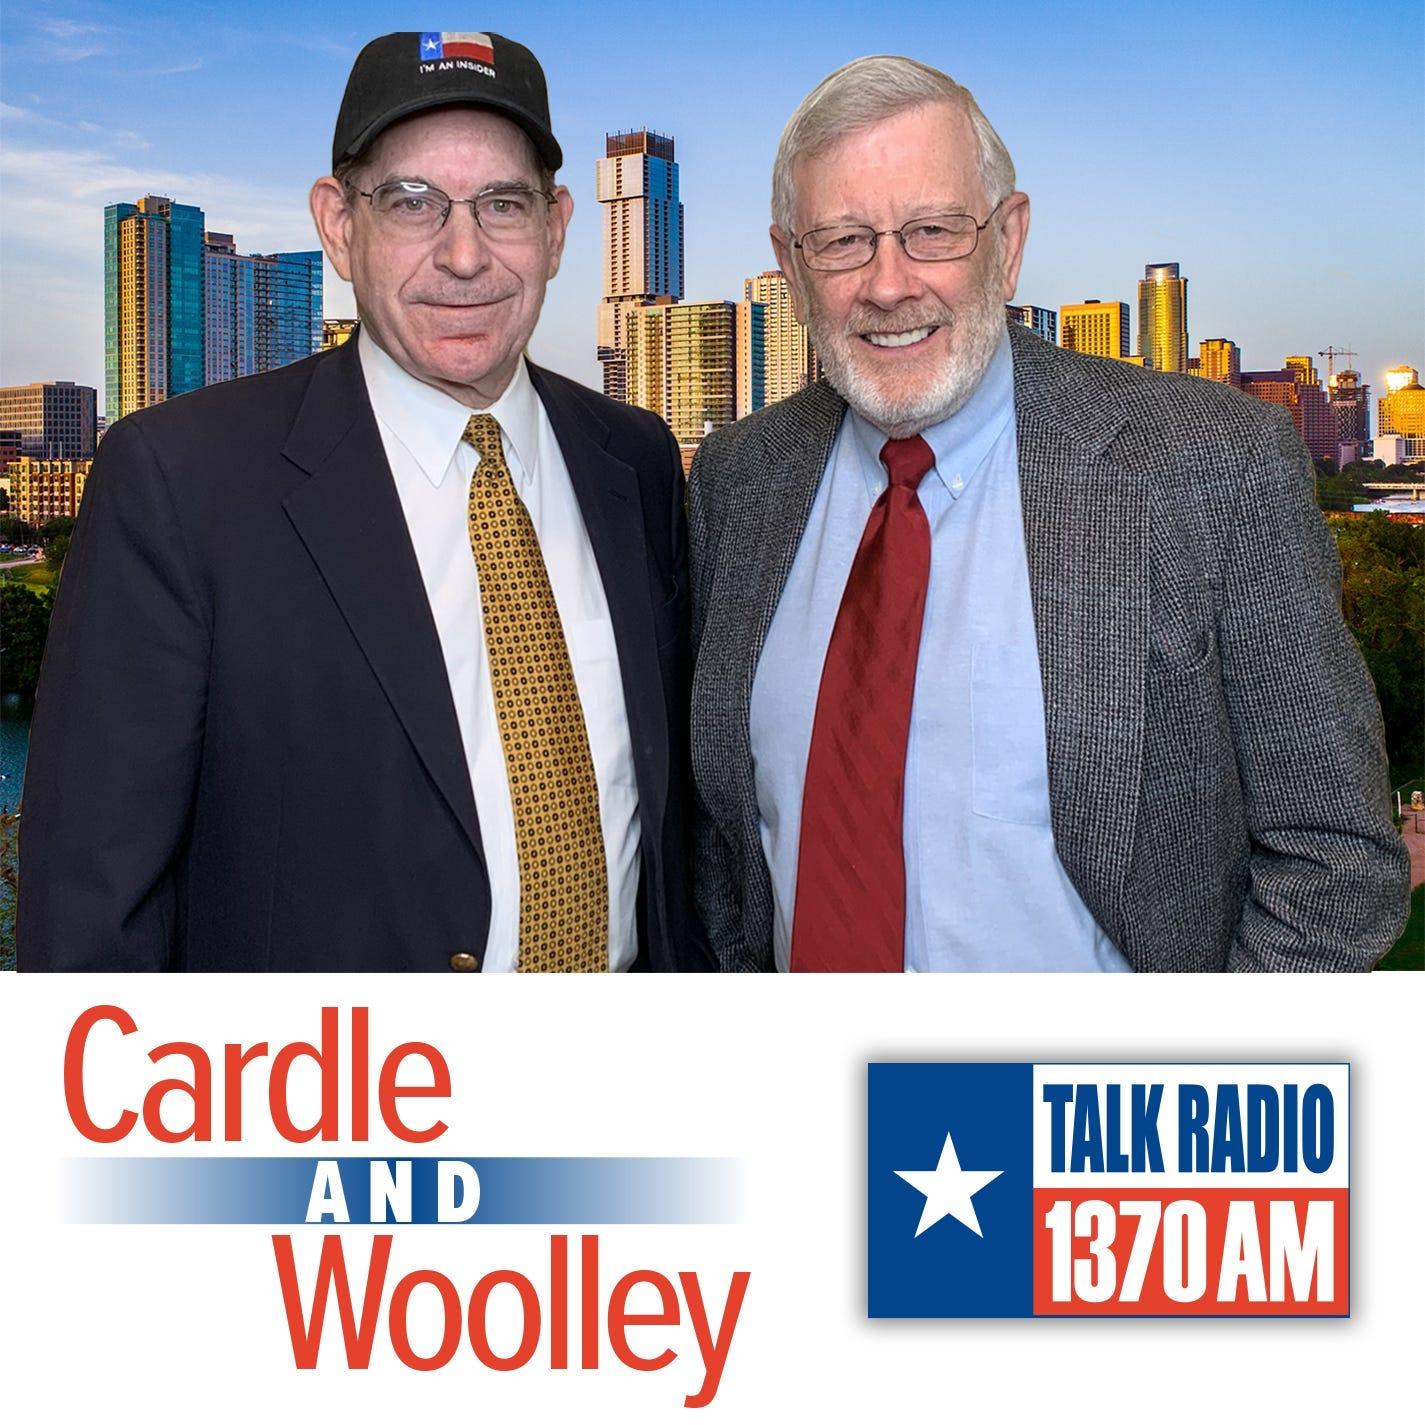 Cardle & Woolley